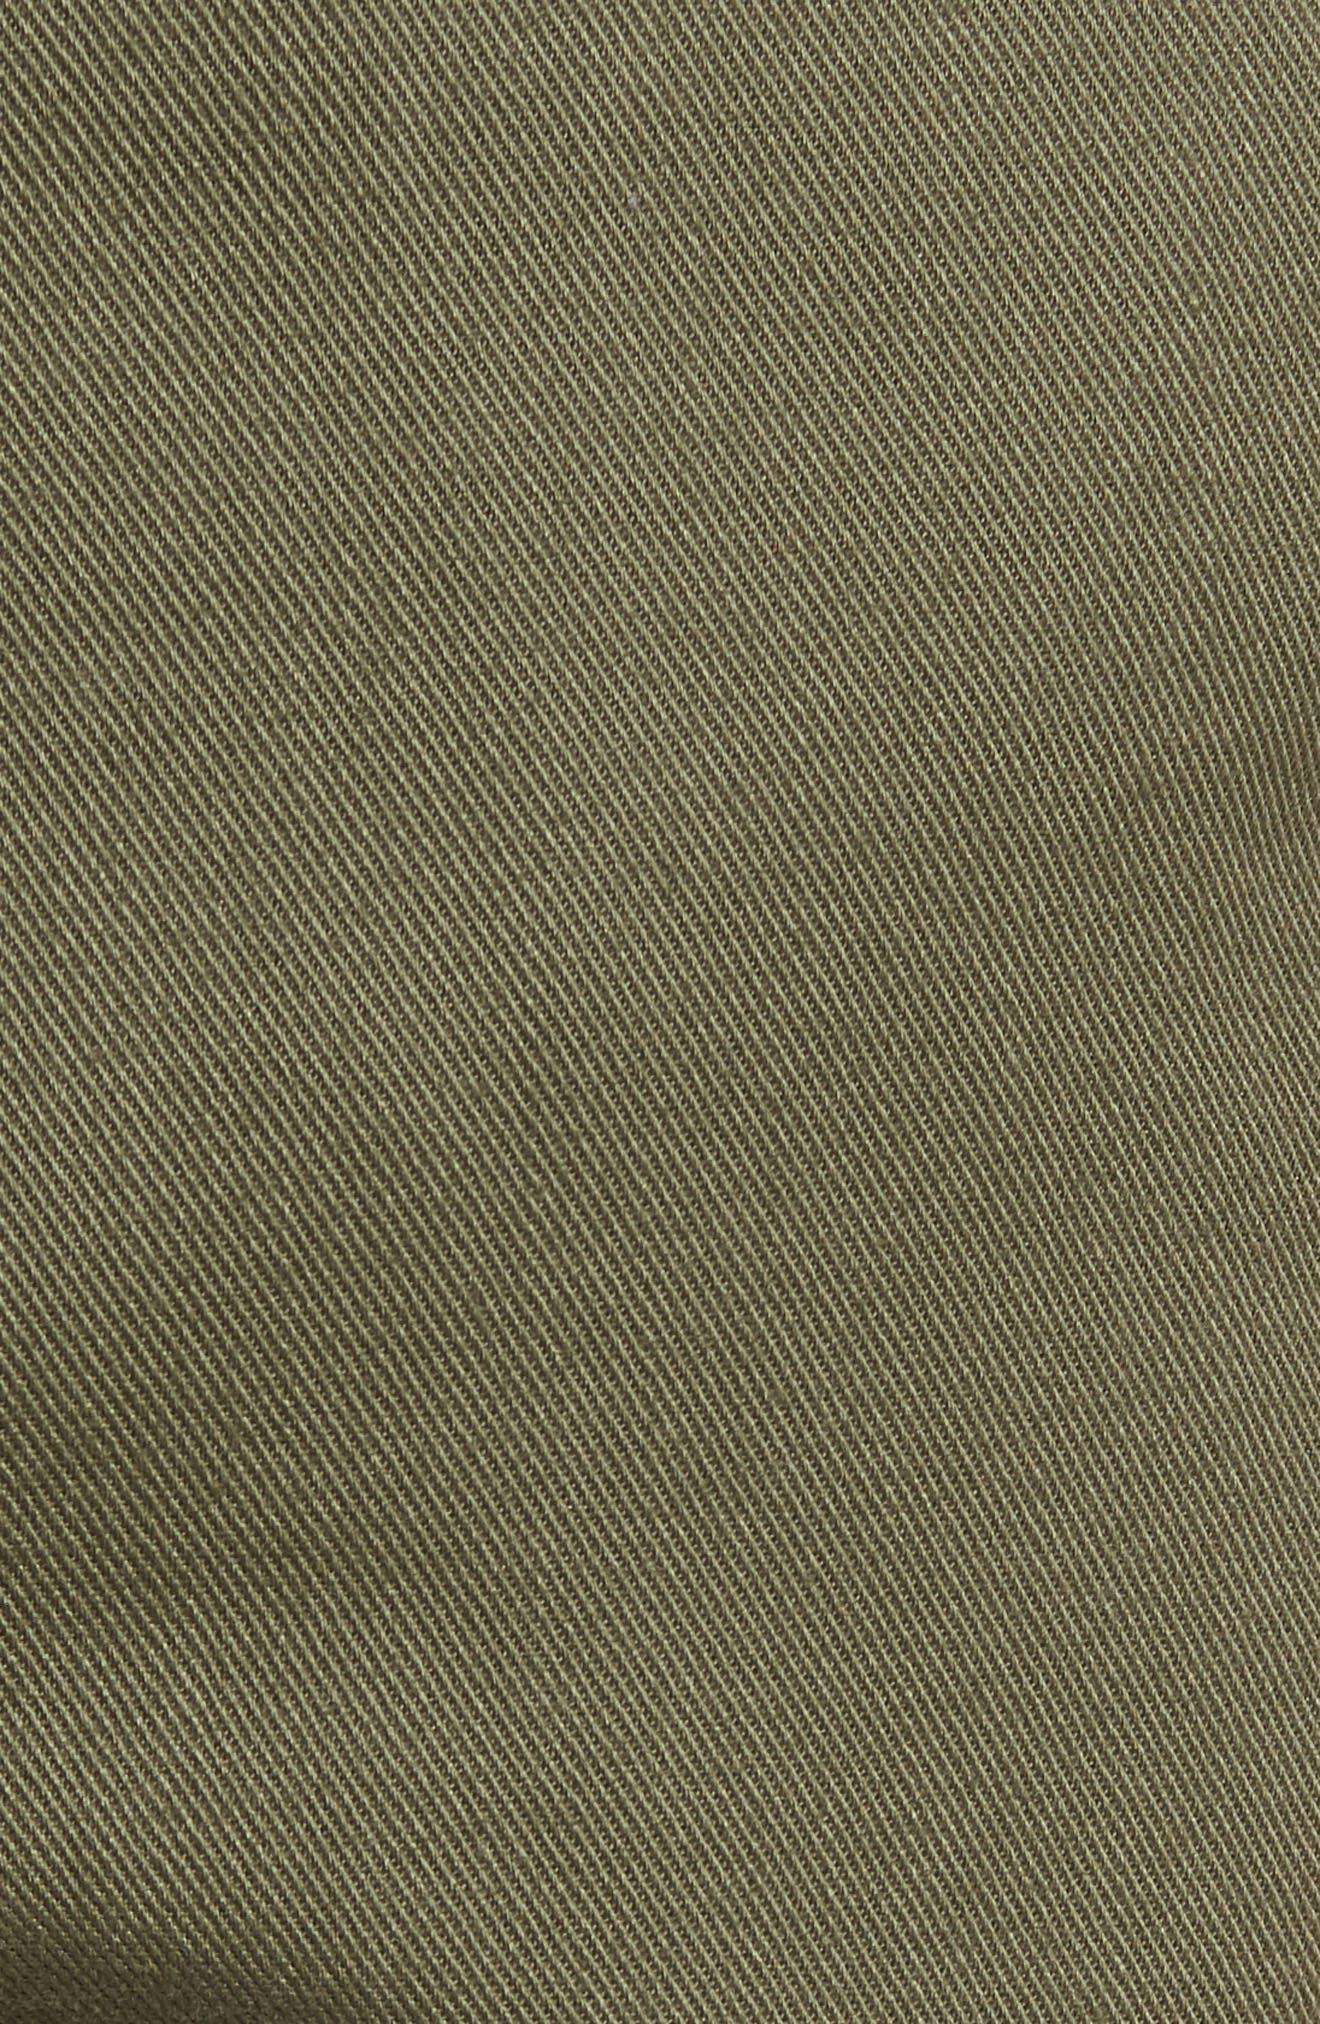 VSM Prowler Shorts,                             Alternate thumbnail 5, color,                             Military